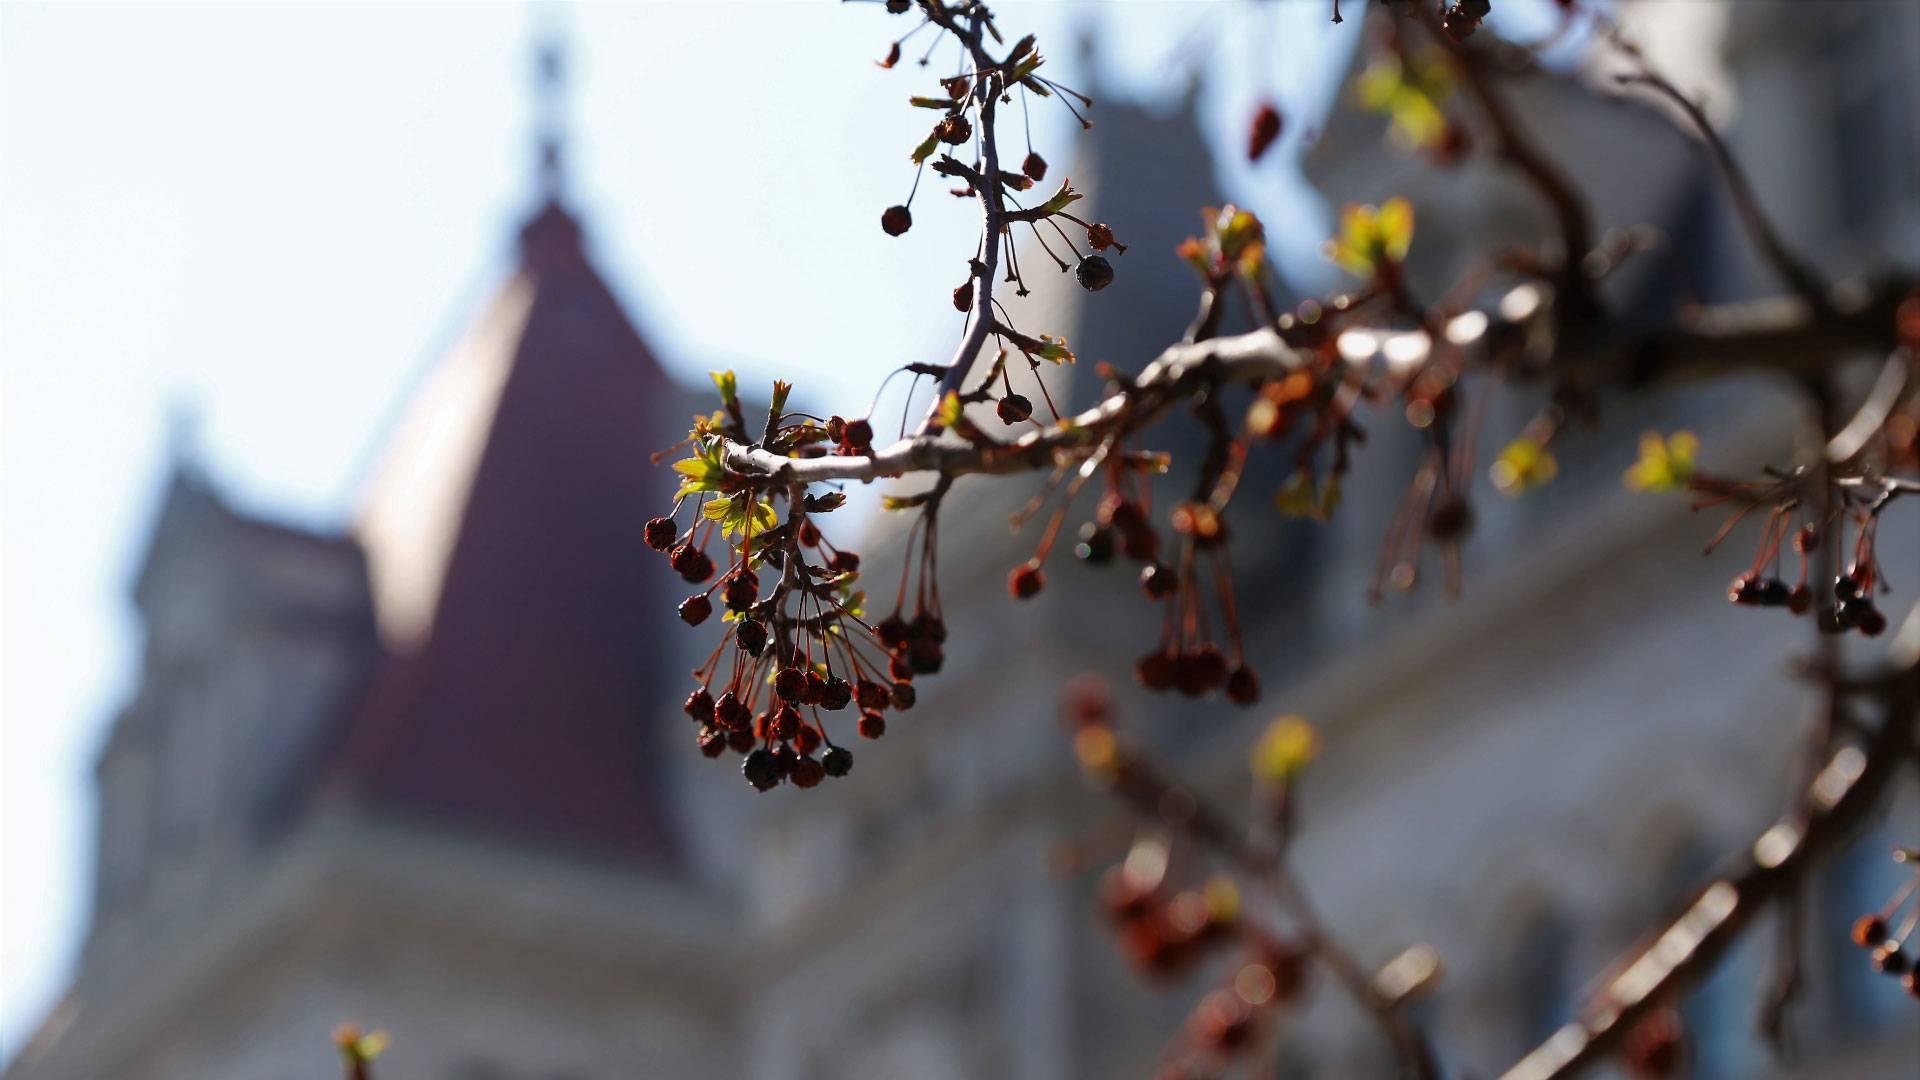 Merit Scholarship expanded after GOP pushback